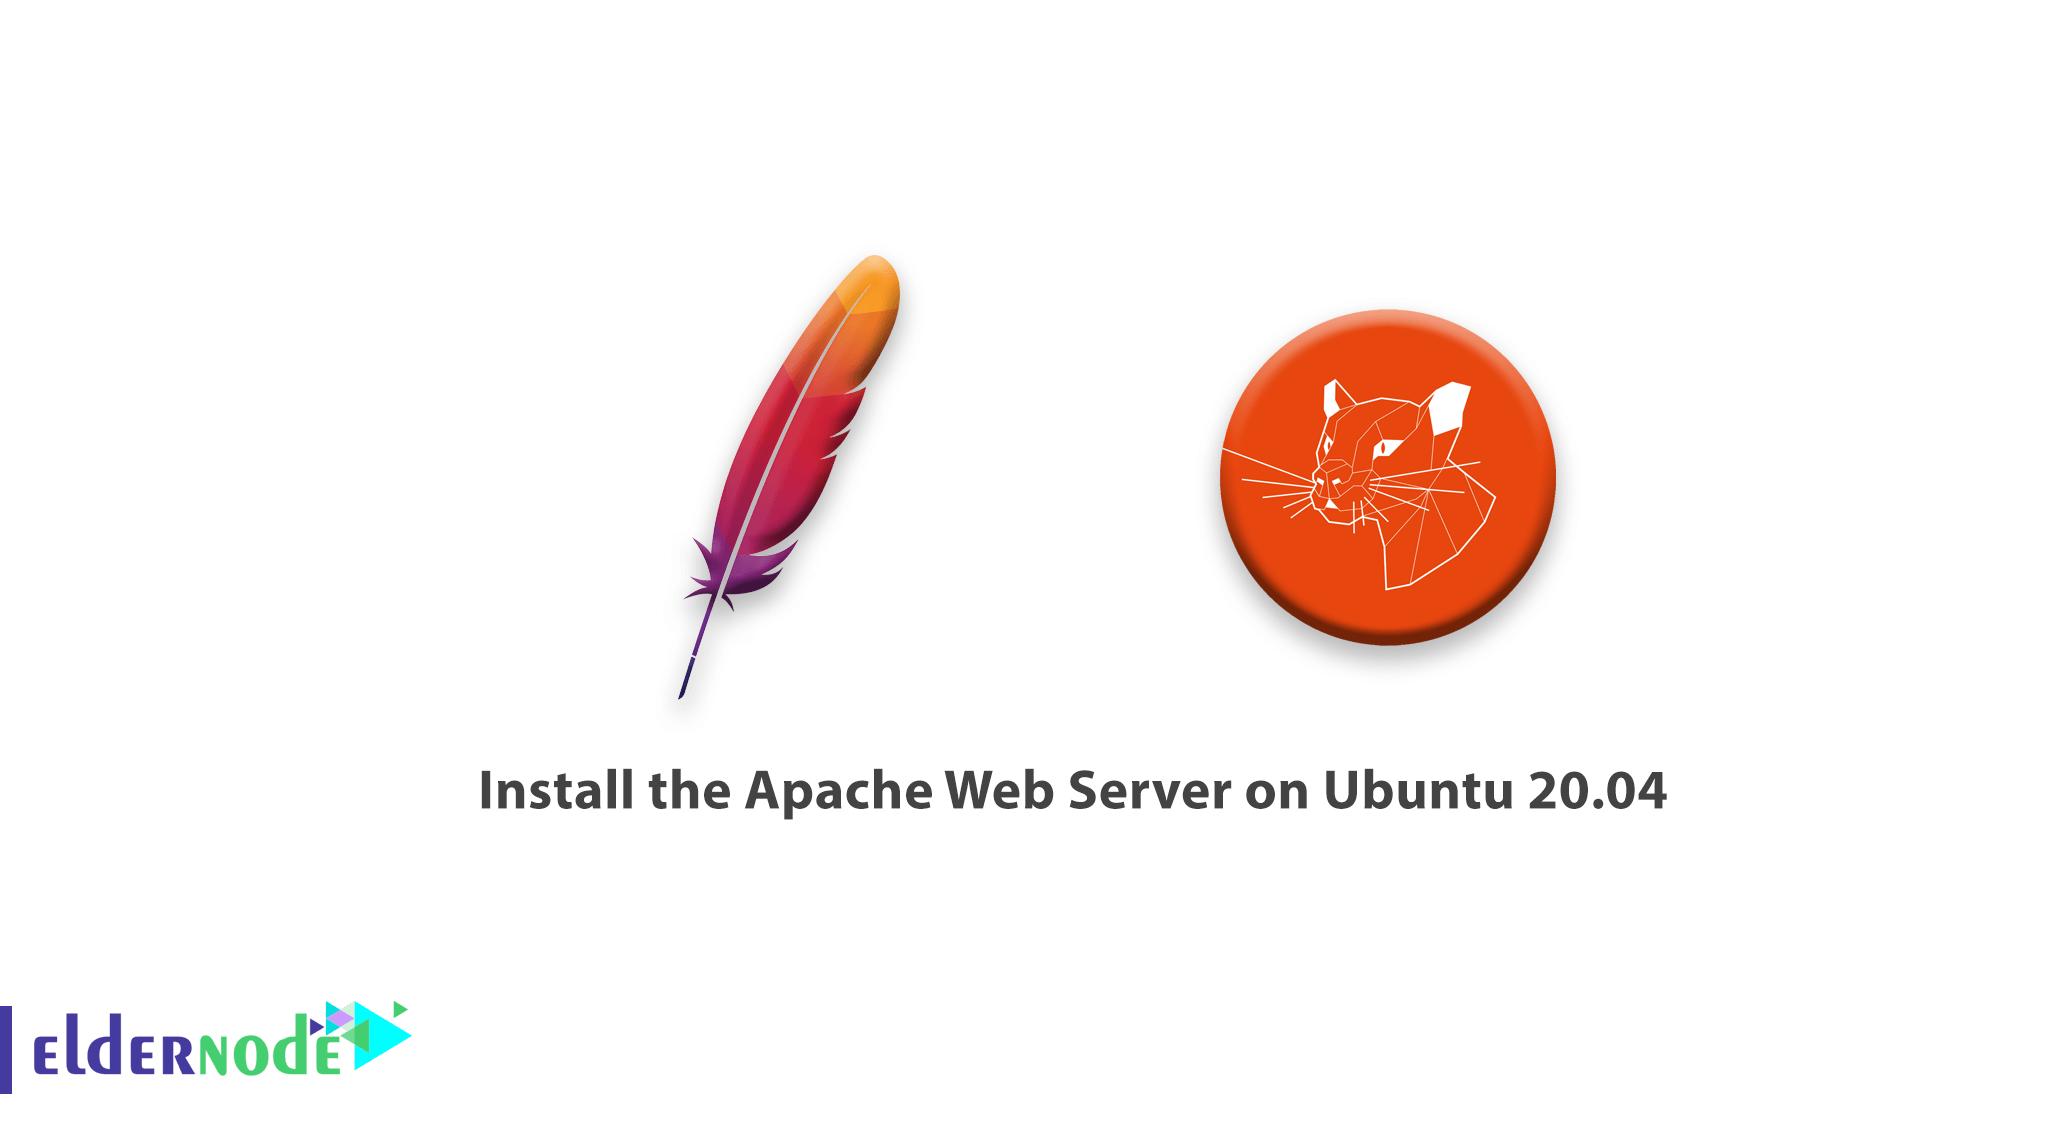 How to install the Apache Web Server on Ubuntu 20.04